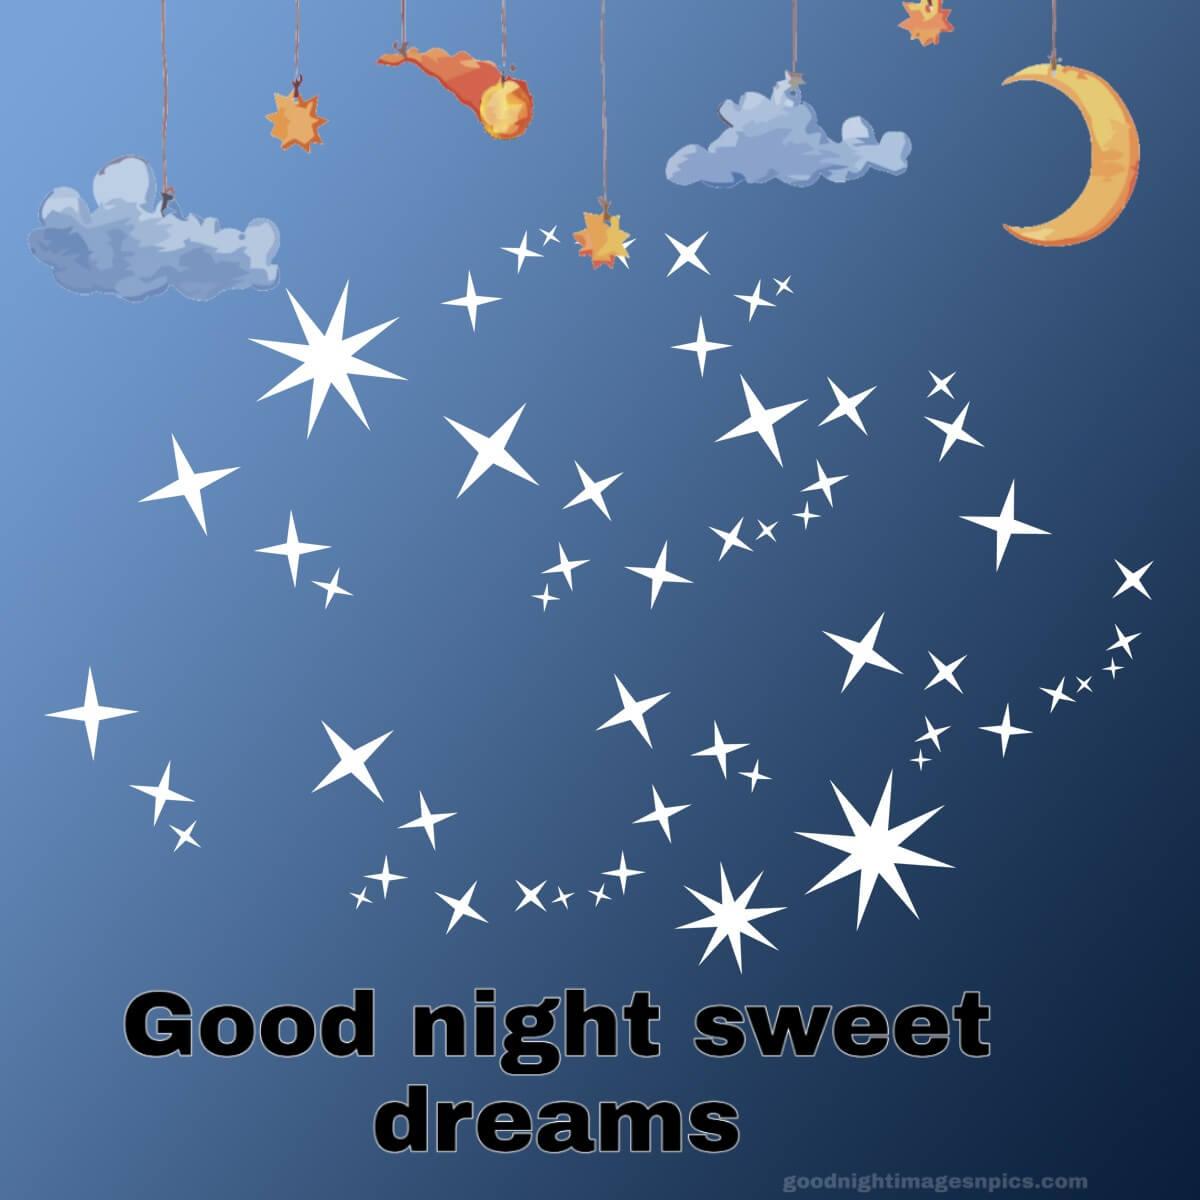 image good night